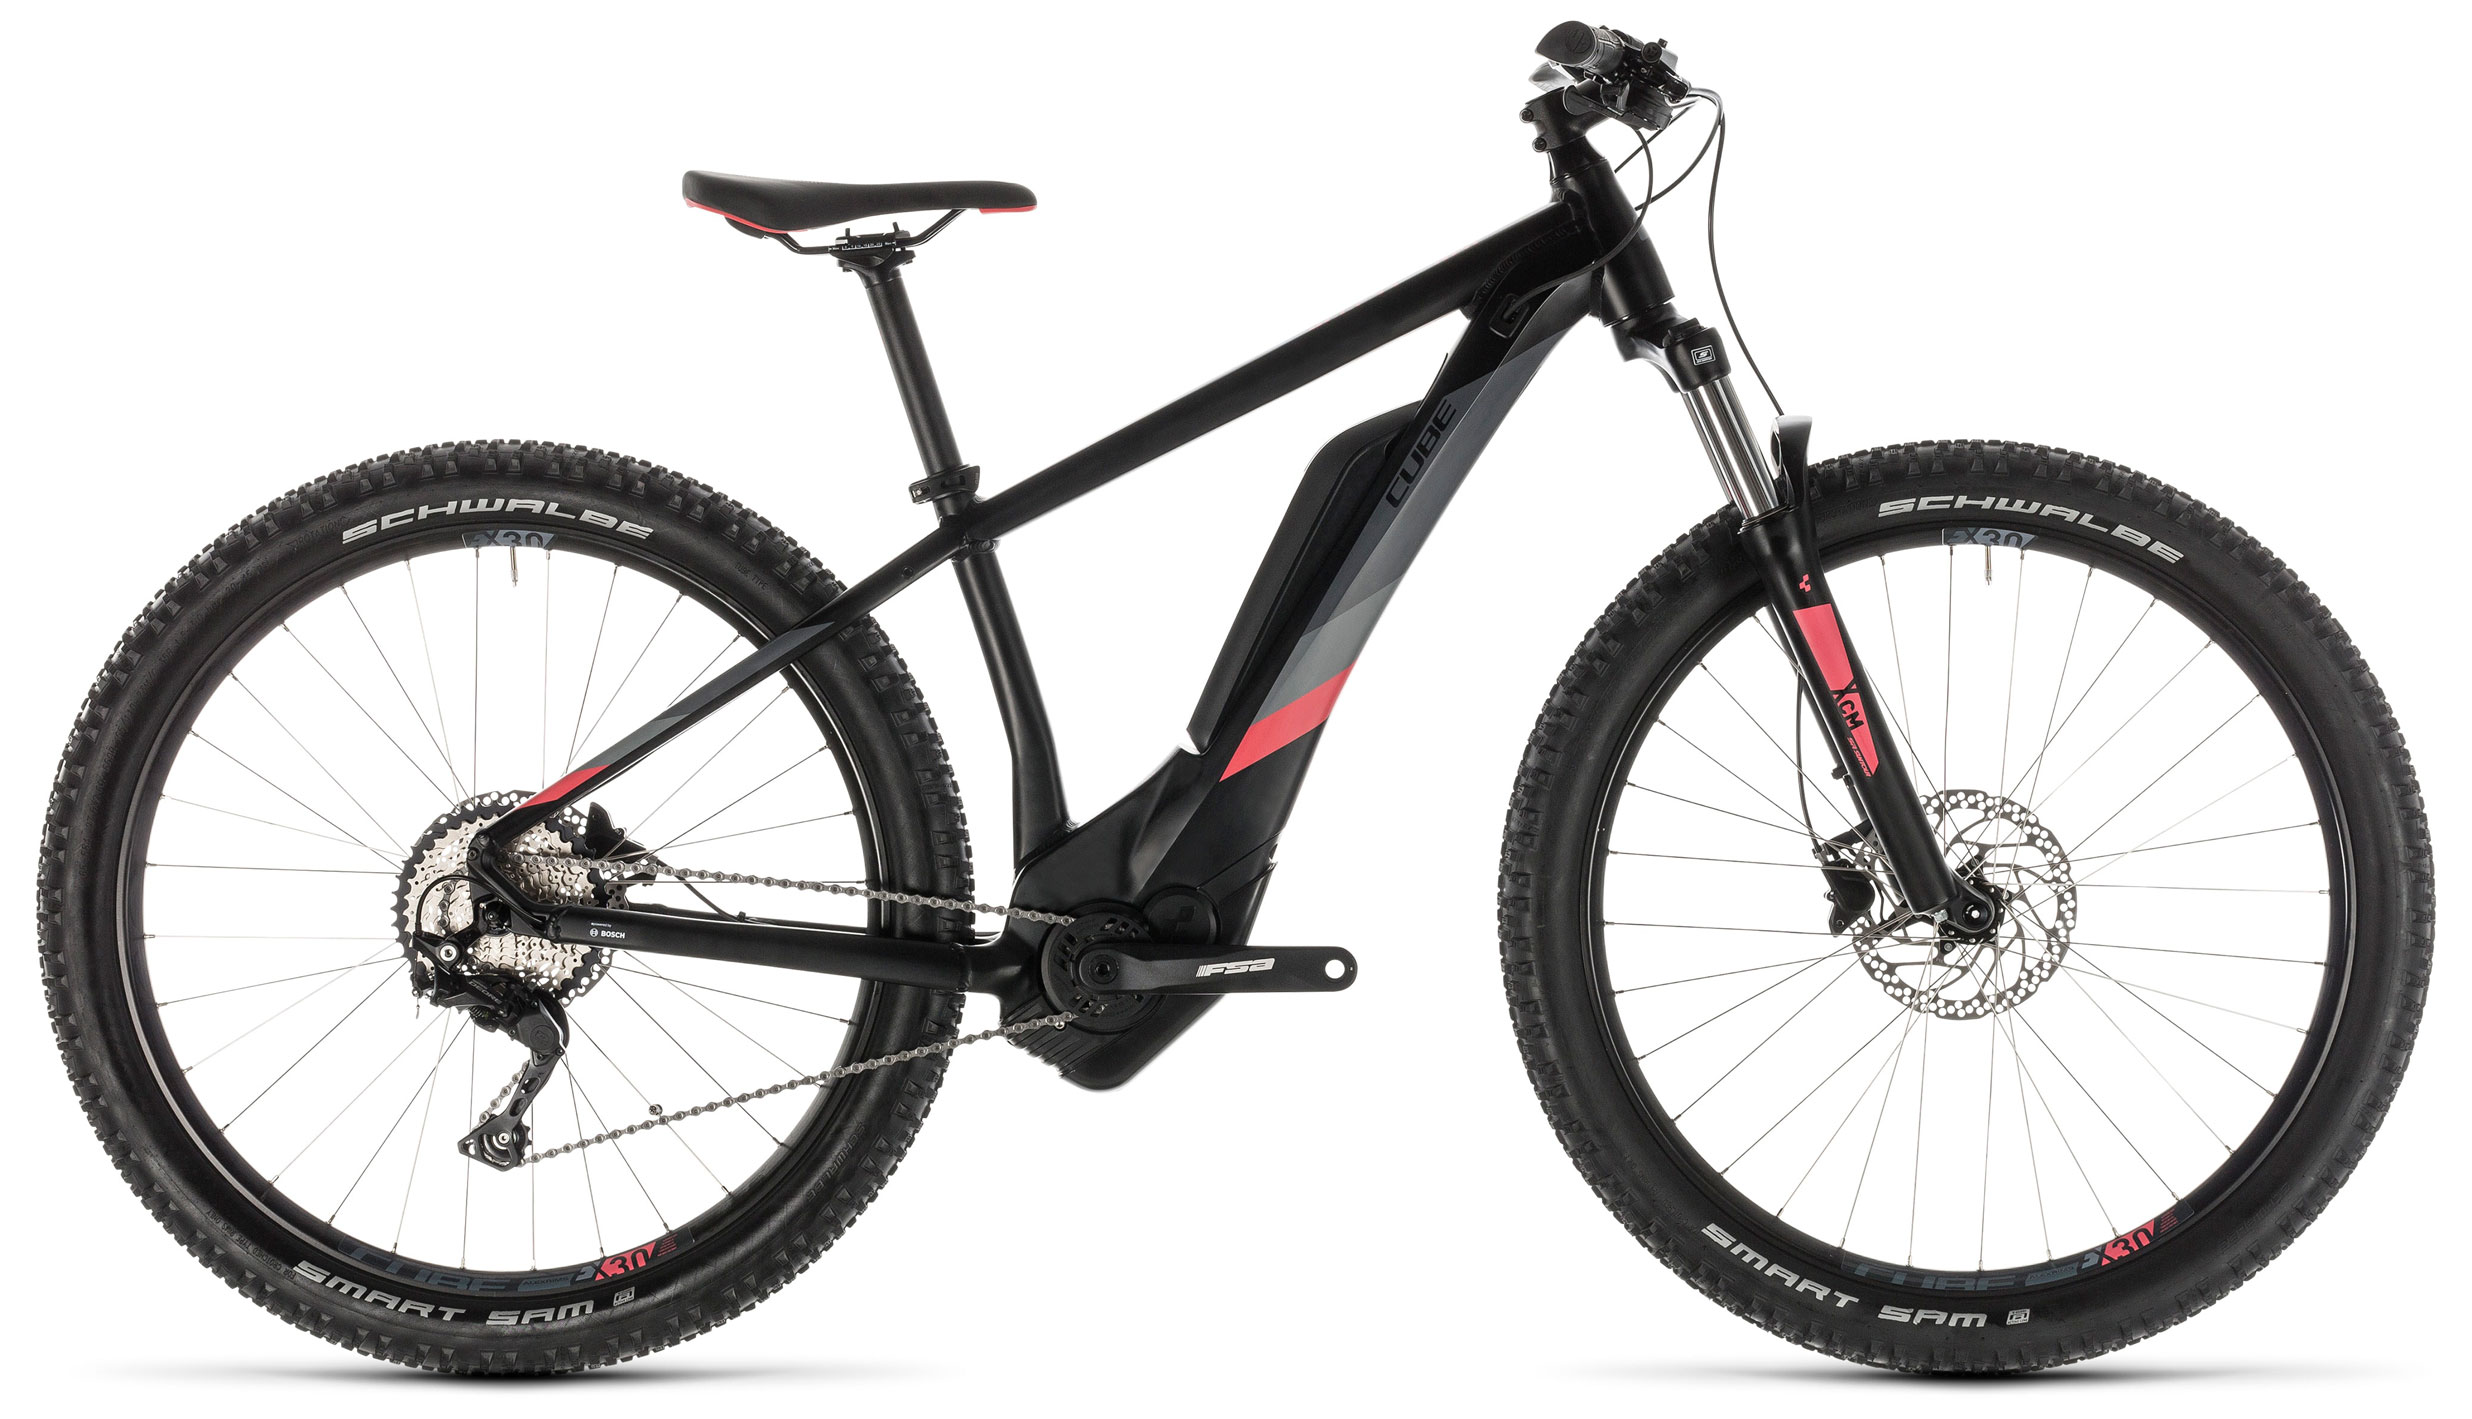 Велосипед Cube Access WS Hybrid Pro 500 29 2019 велосипед cube access ws sl 29 2018